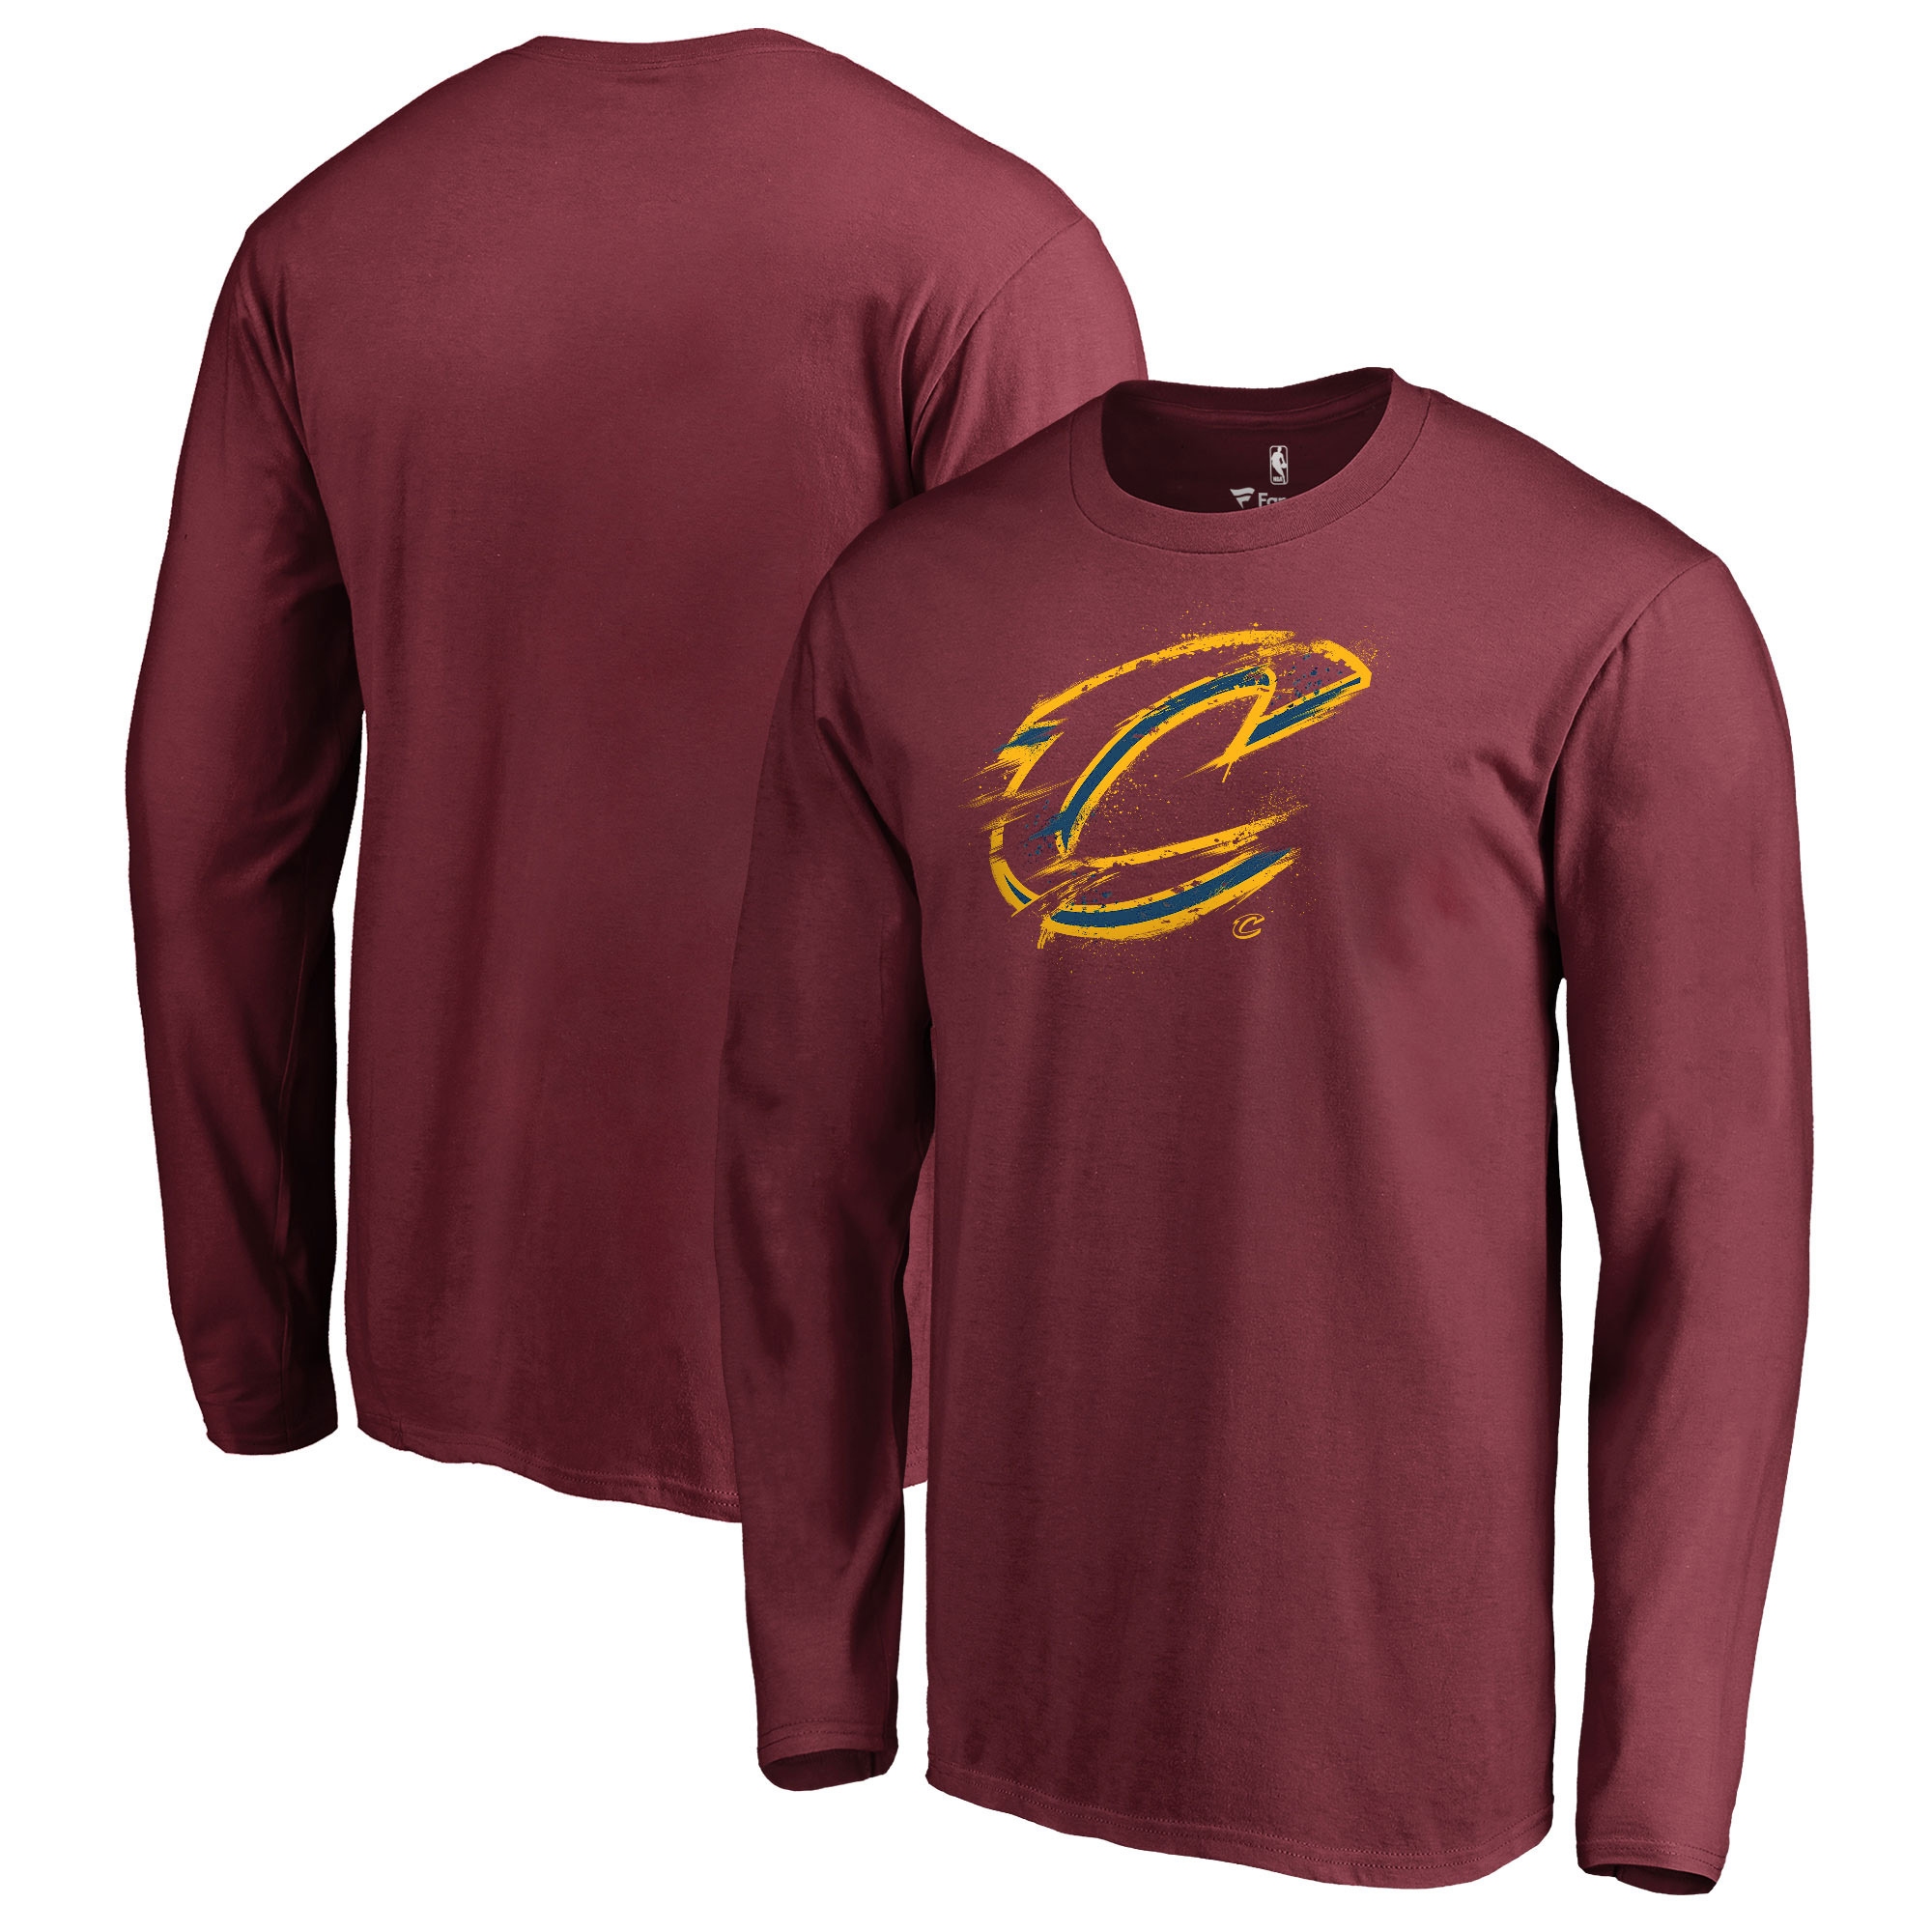 Cleveland Cavaliers Fanatics Branded Spatter Logo Long Sleeve T-Shirt - Wine